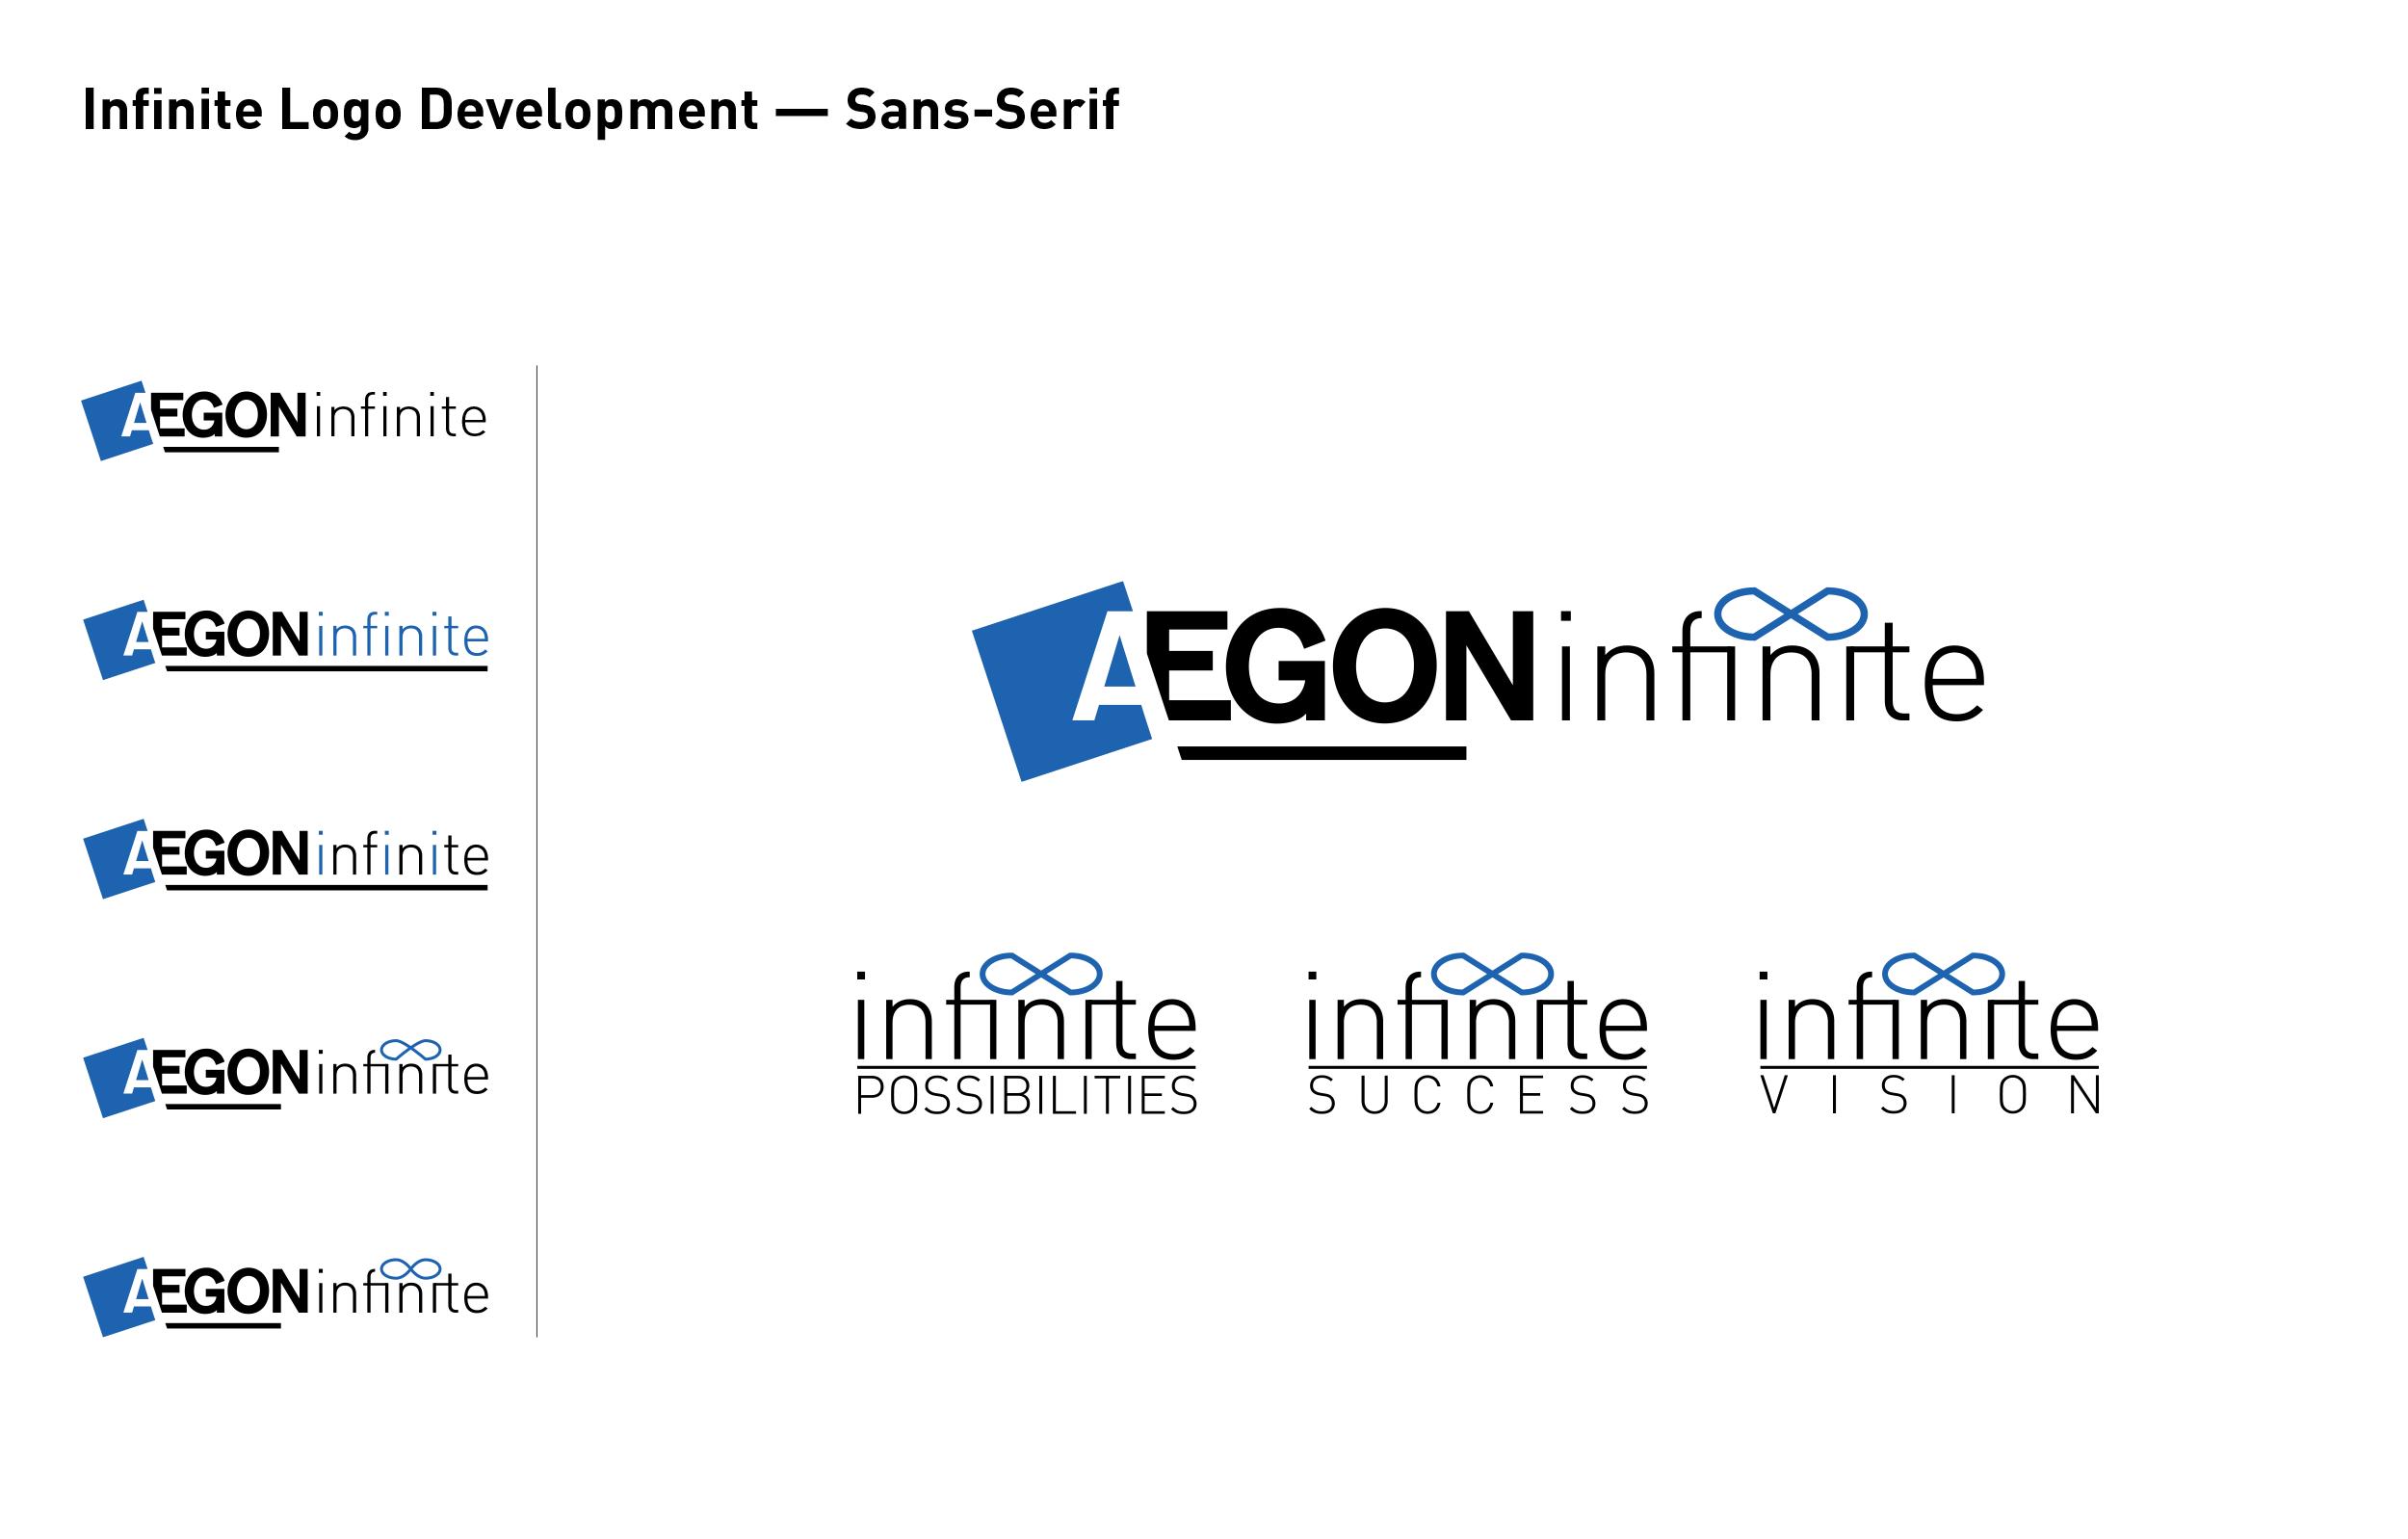 US0010_AEGON_Logo_Pres_stg1-2.png